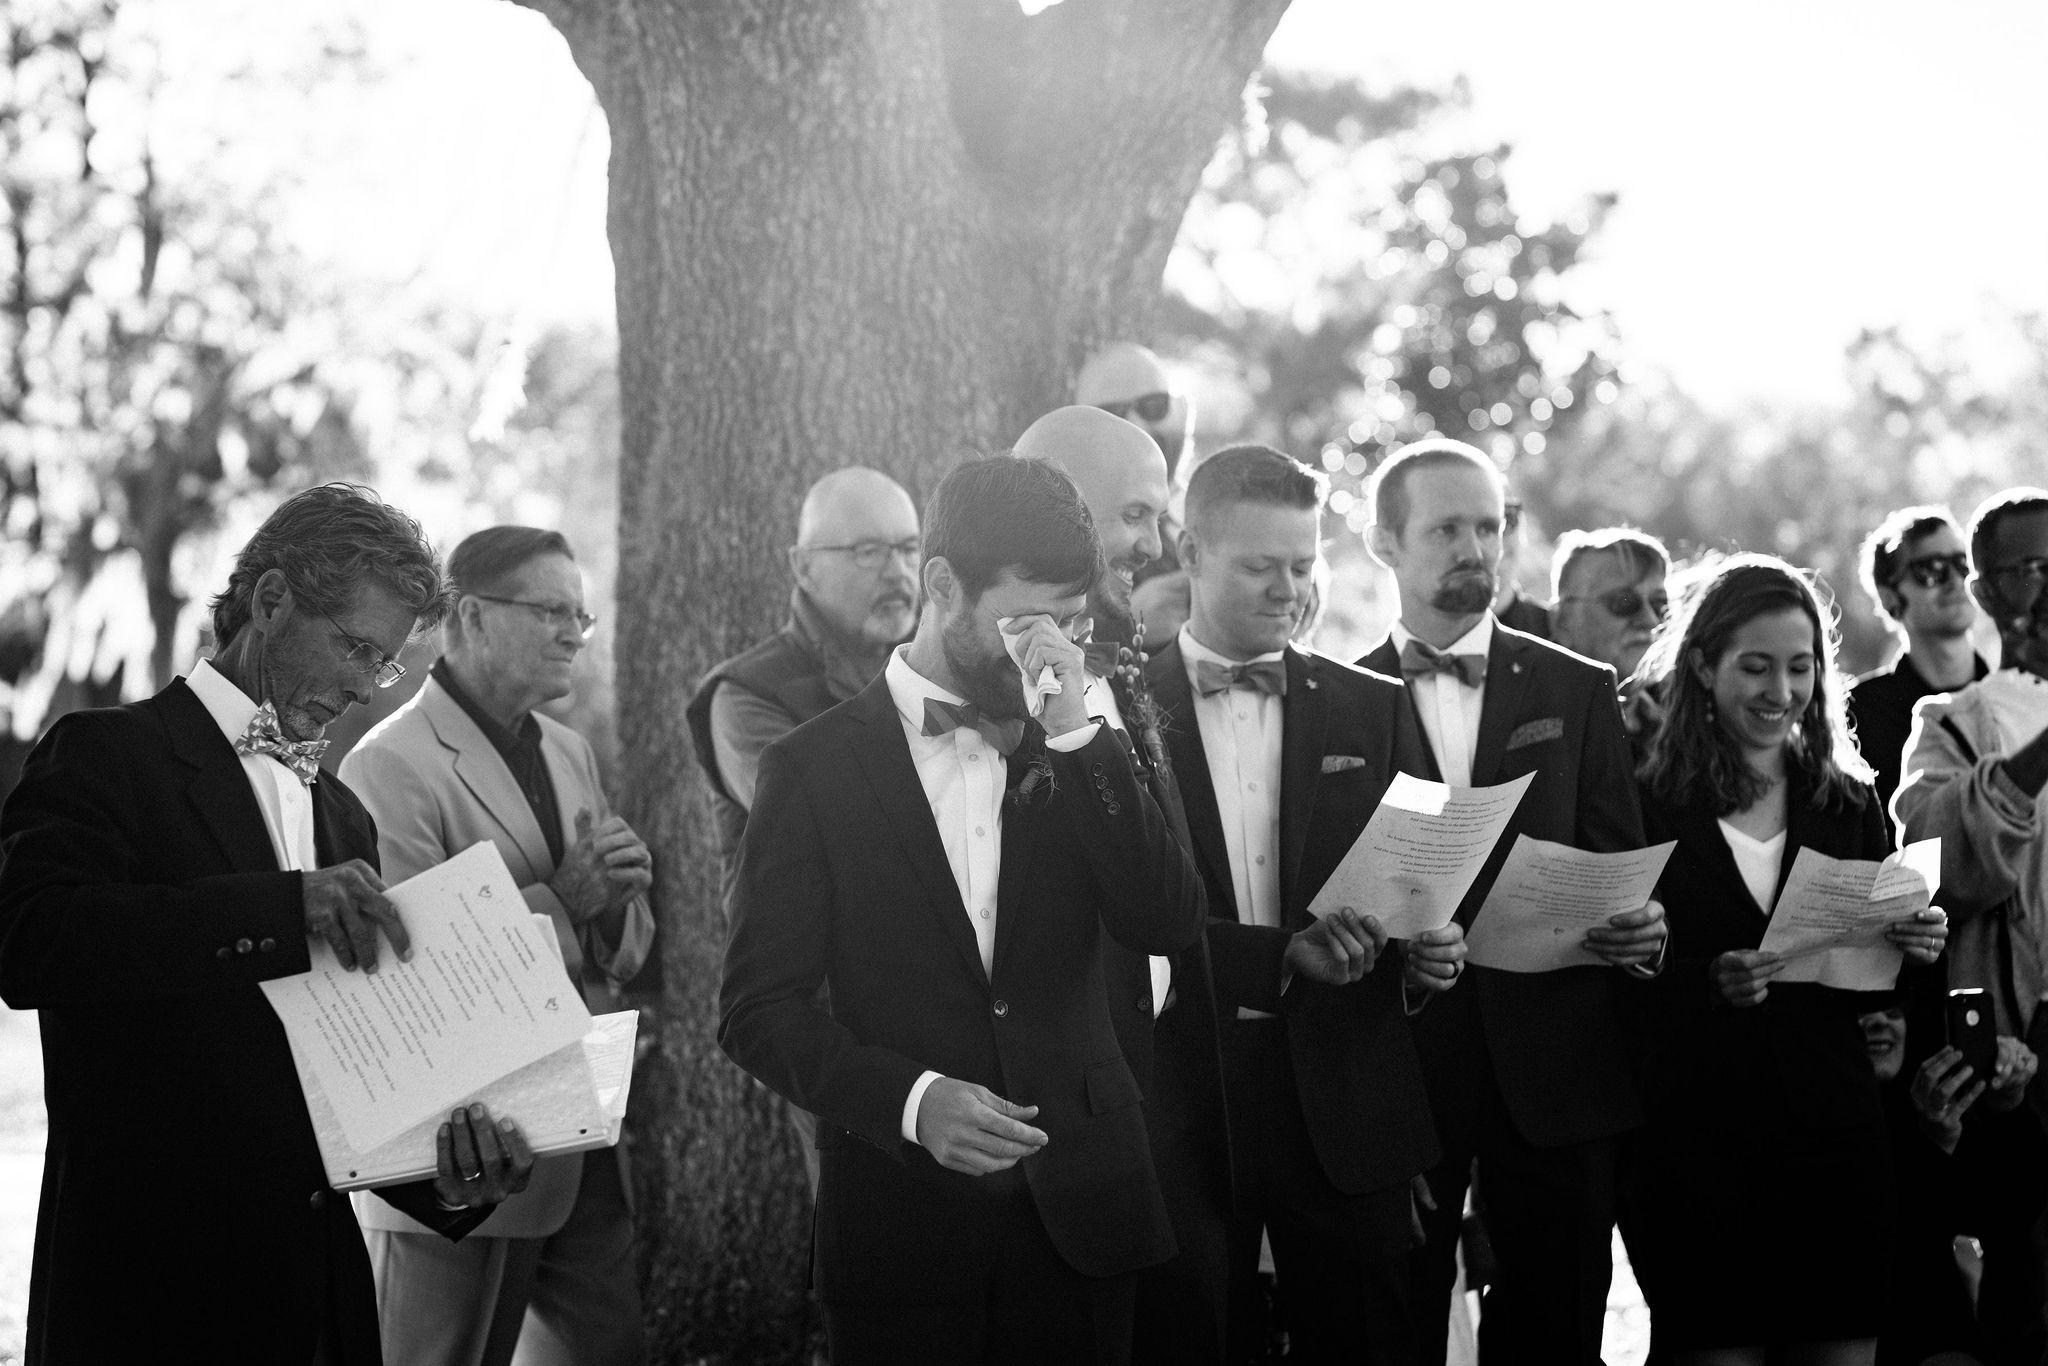 JesseandLex_190105_Brit_Evan_Ceremony_052.jpg